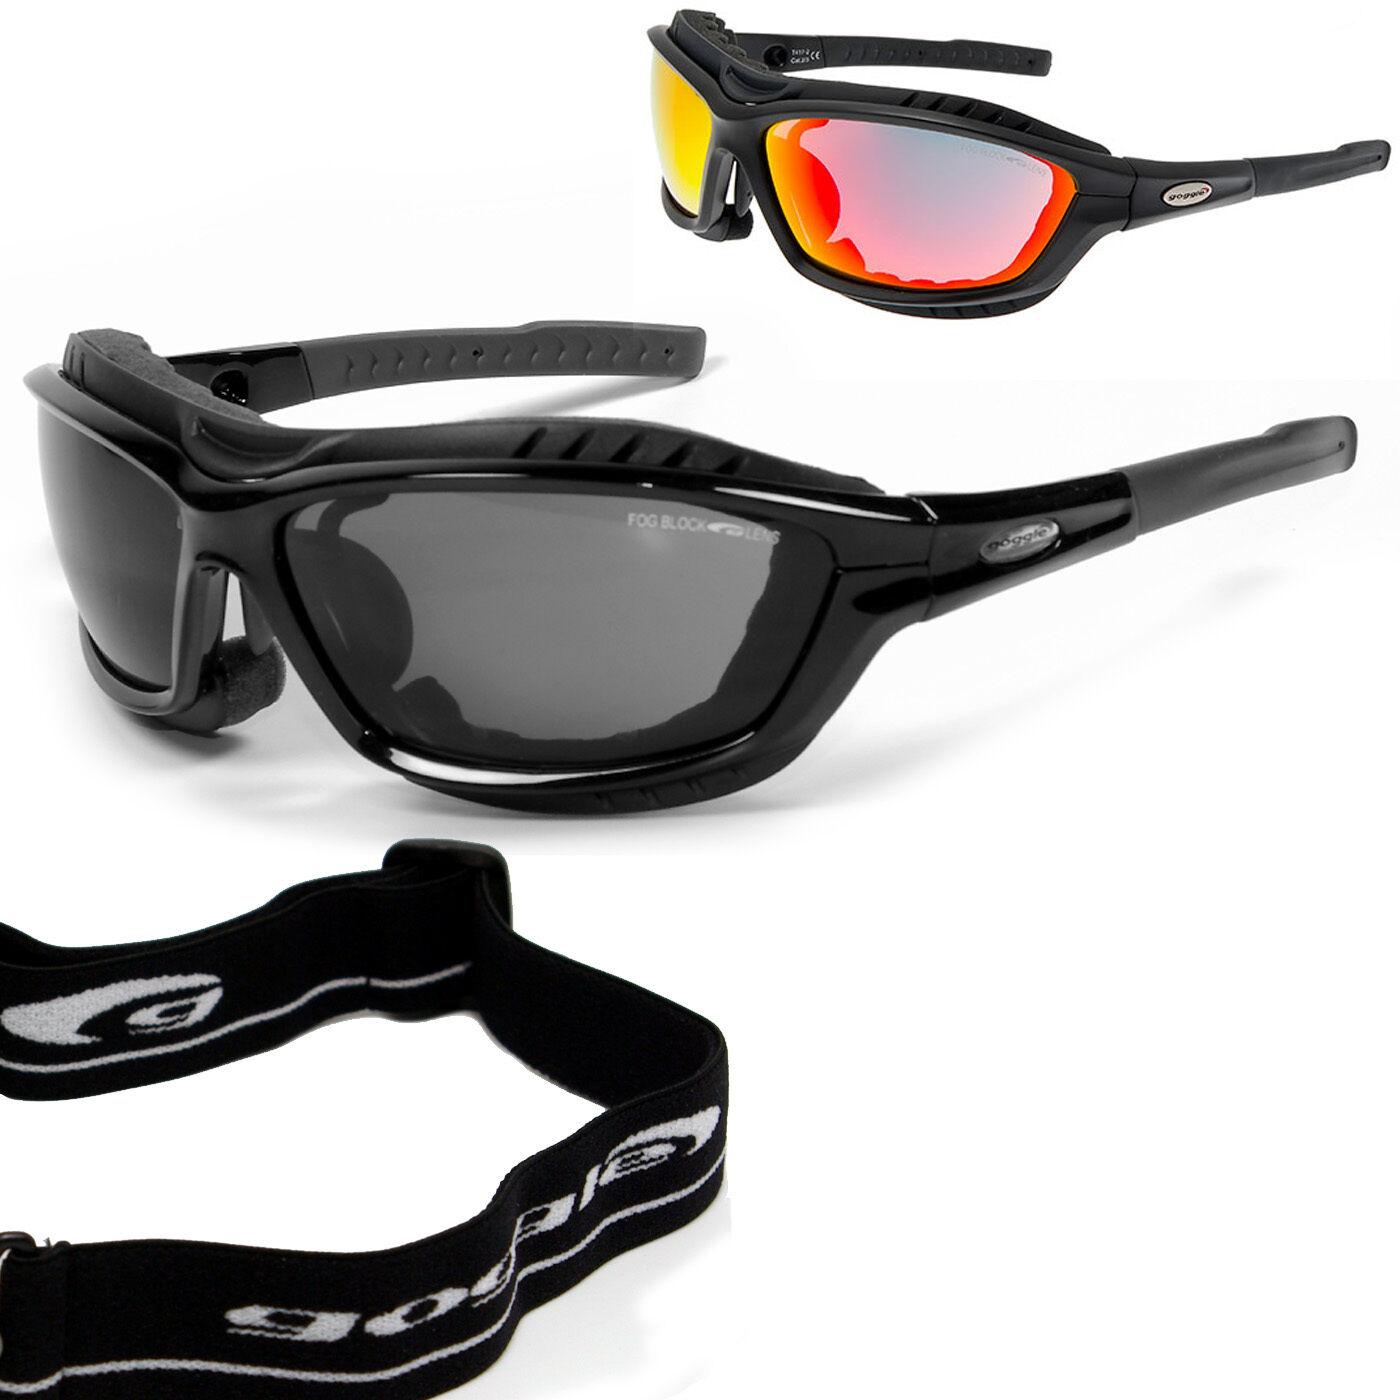 Goggle Polarisierende Skibrille Sportbrille Anit-Fog Anit-Fog Sportbrille NEU 62b247